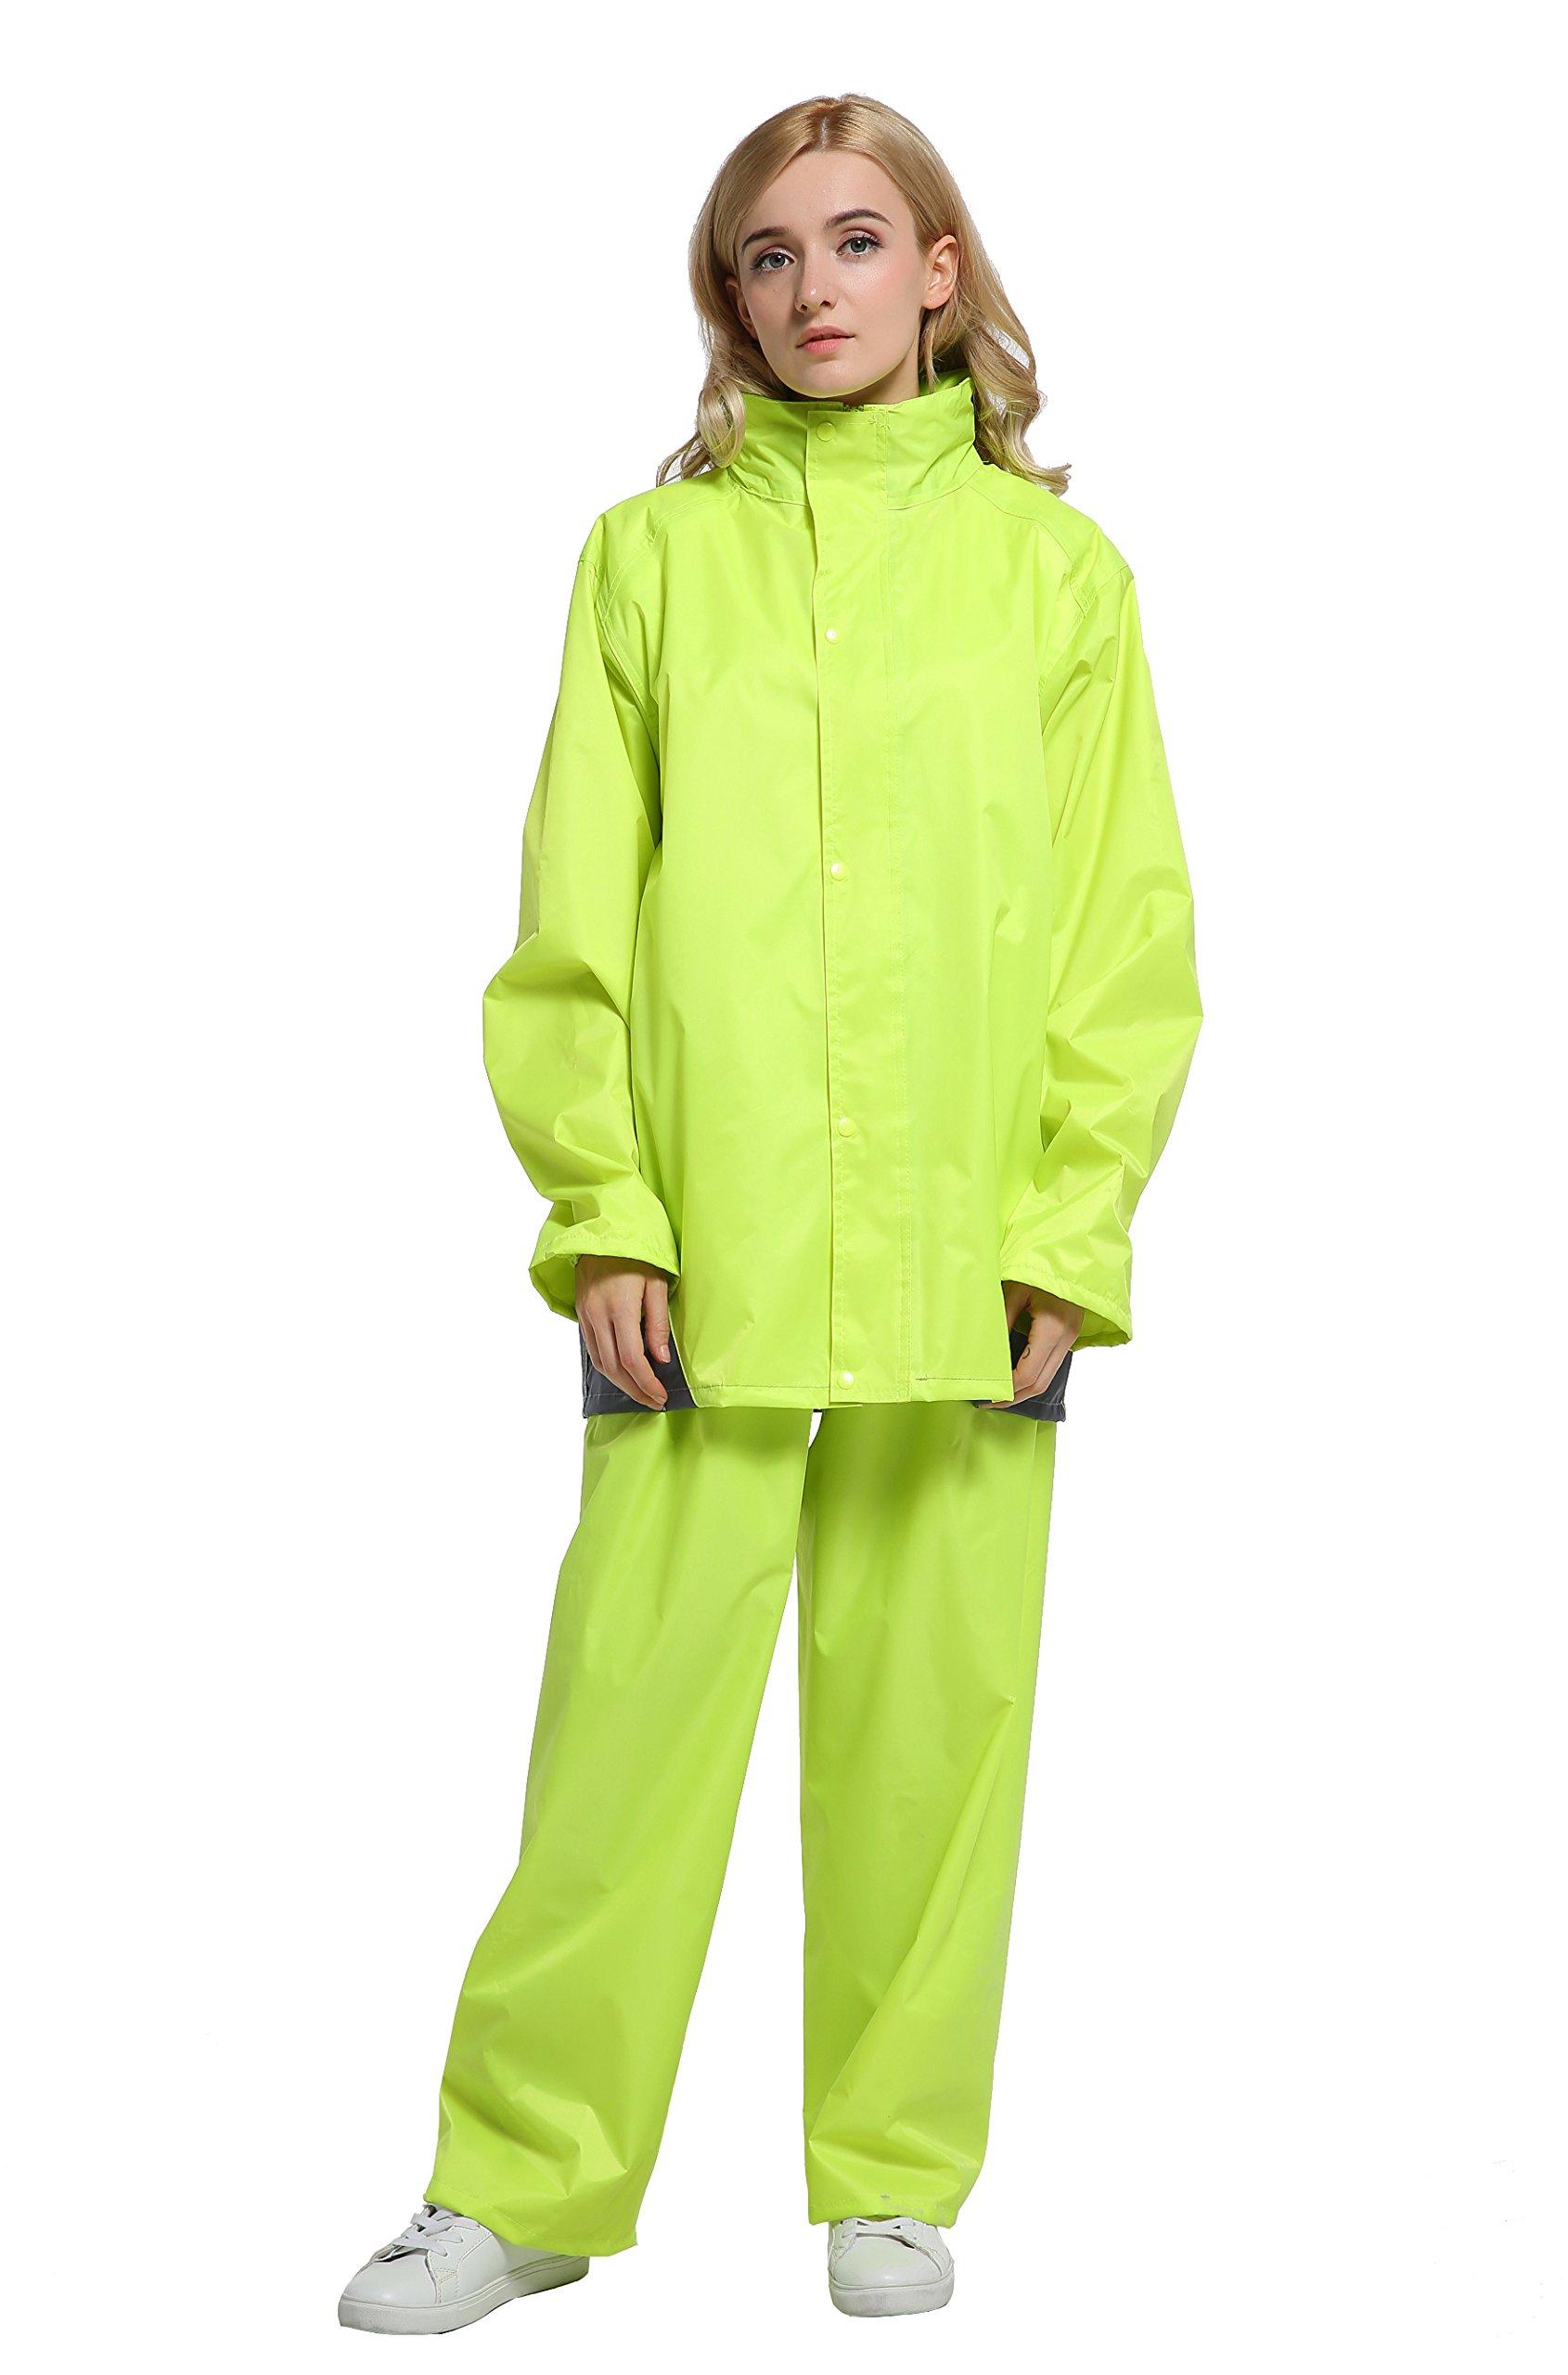 Maiyu Motorcycle Rain Gear 2 Piece Rain Suit Rain Jacket and Rain Pants Set (Yellow, Large)